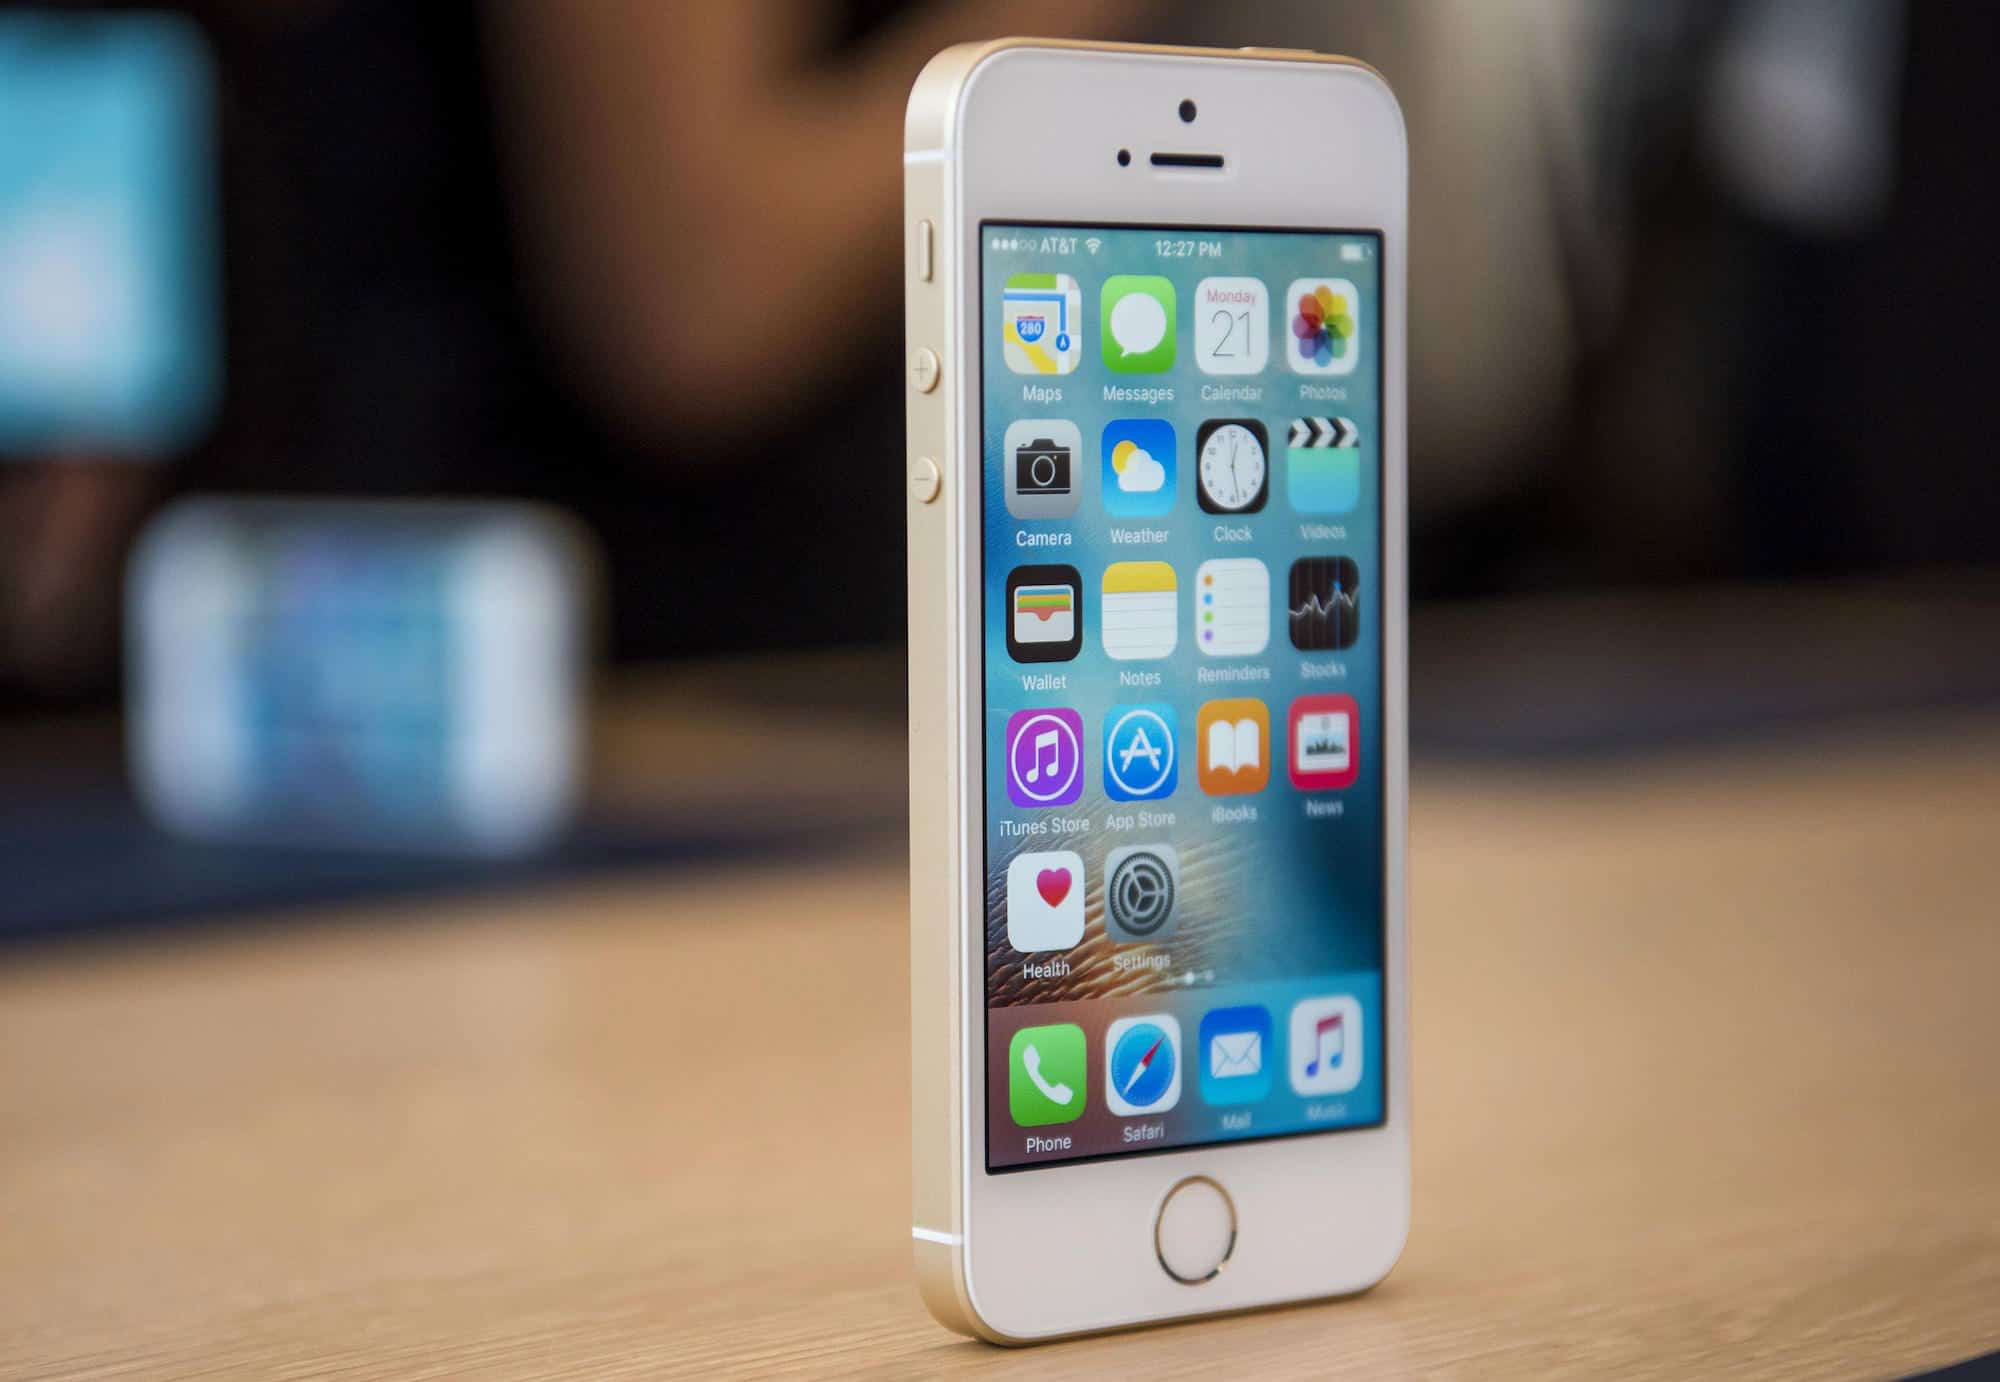 iOS 9.3.2 Jailbreak Pangu Hacker Download